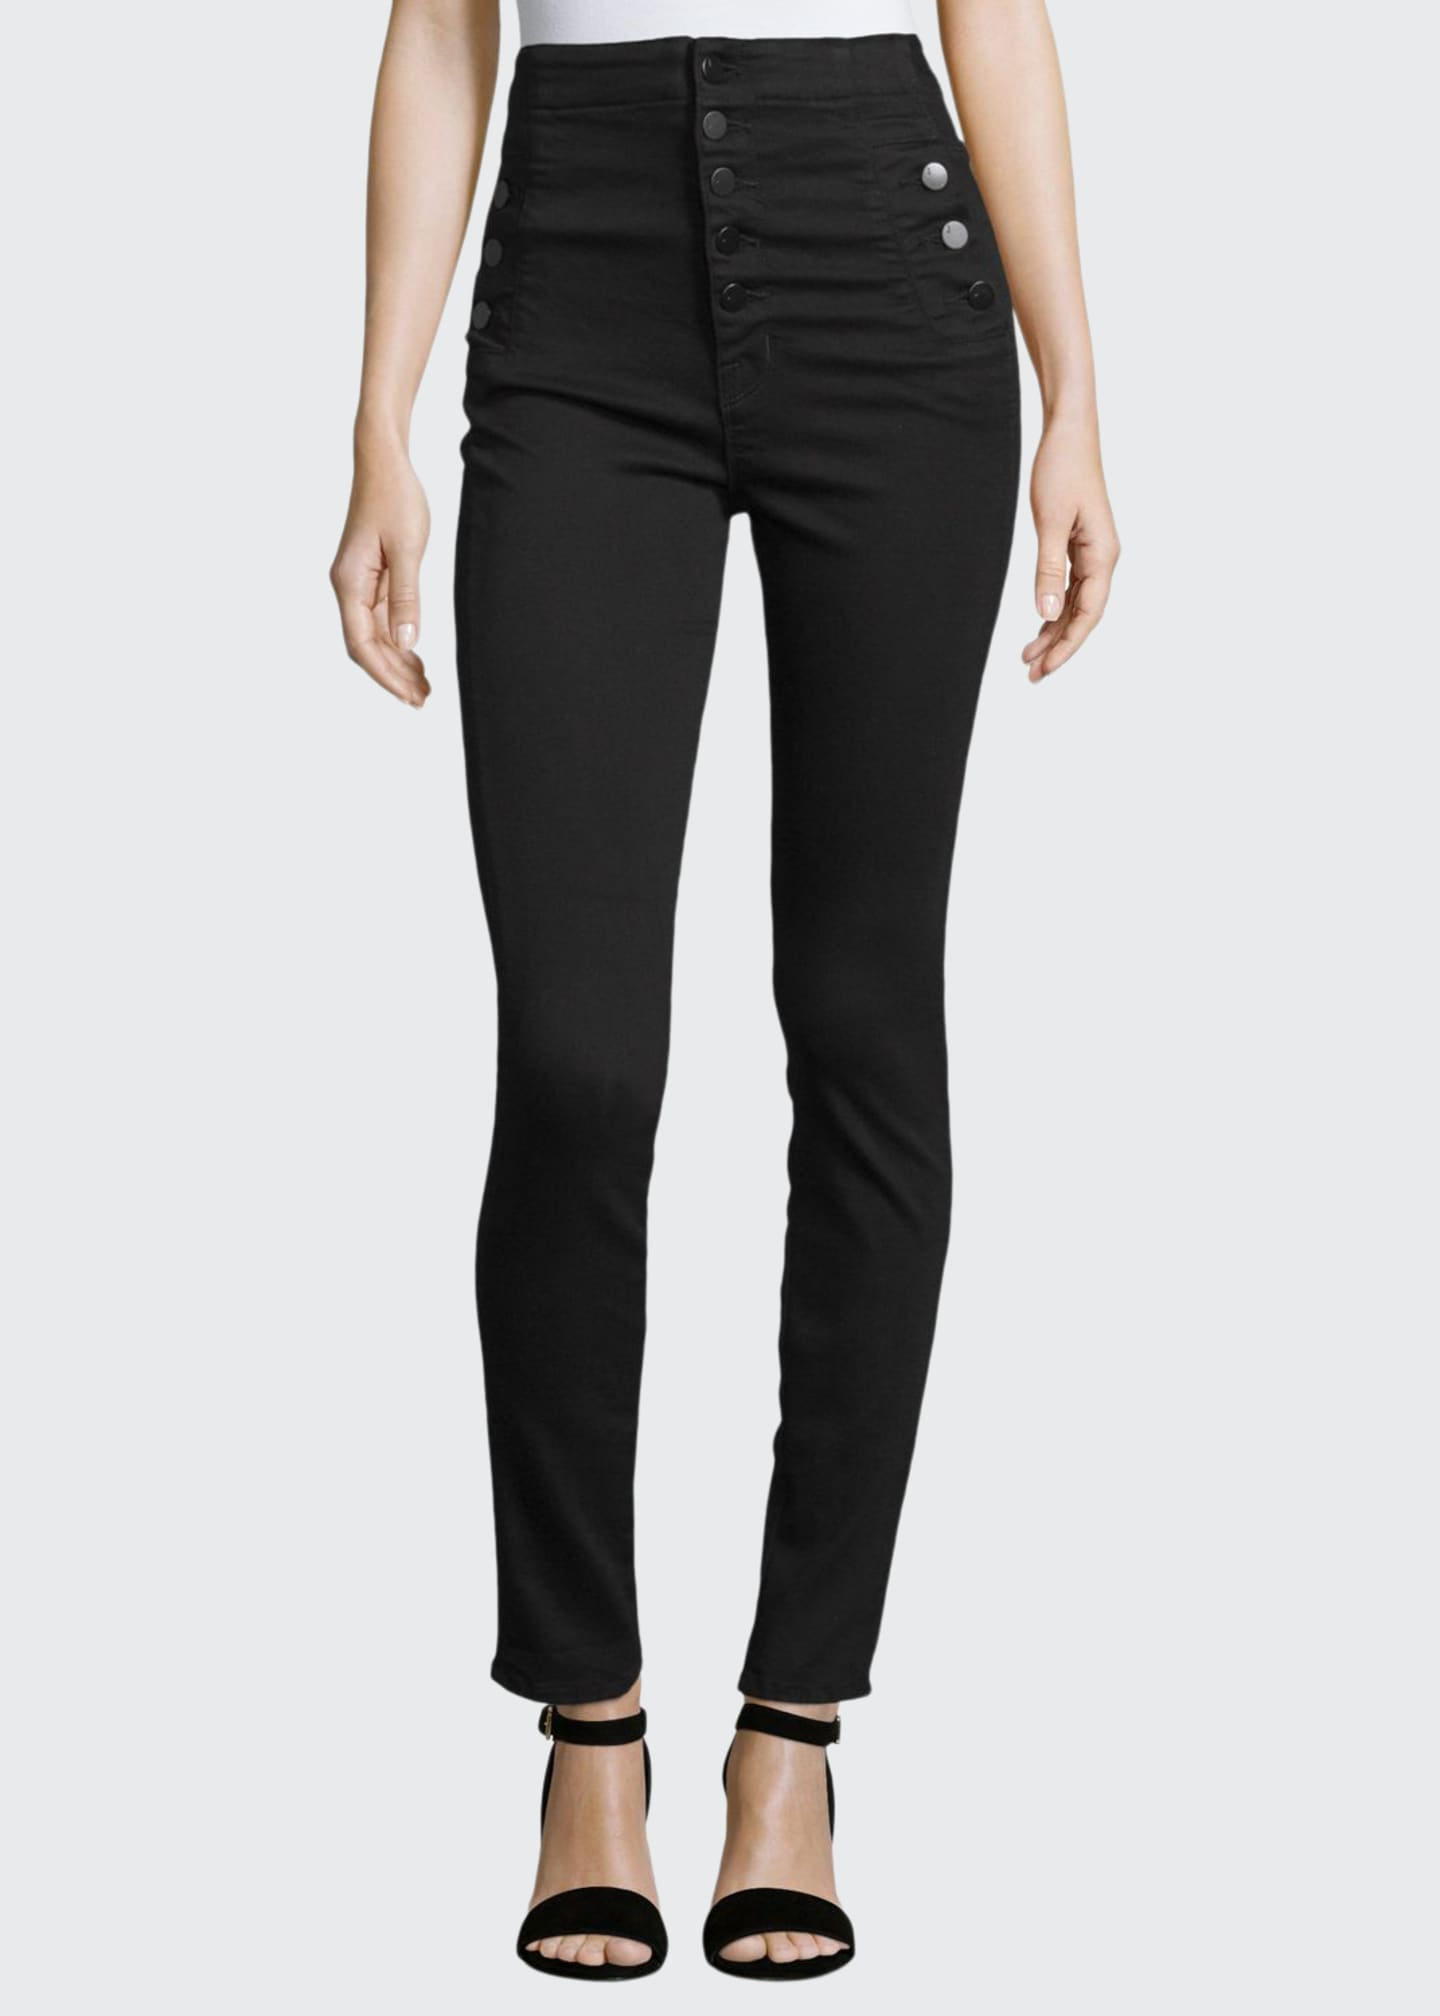 J Brand Natasha High-Waist Skinny Jeans, Black